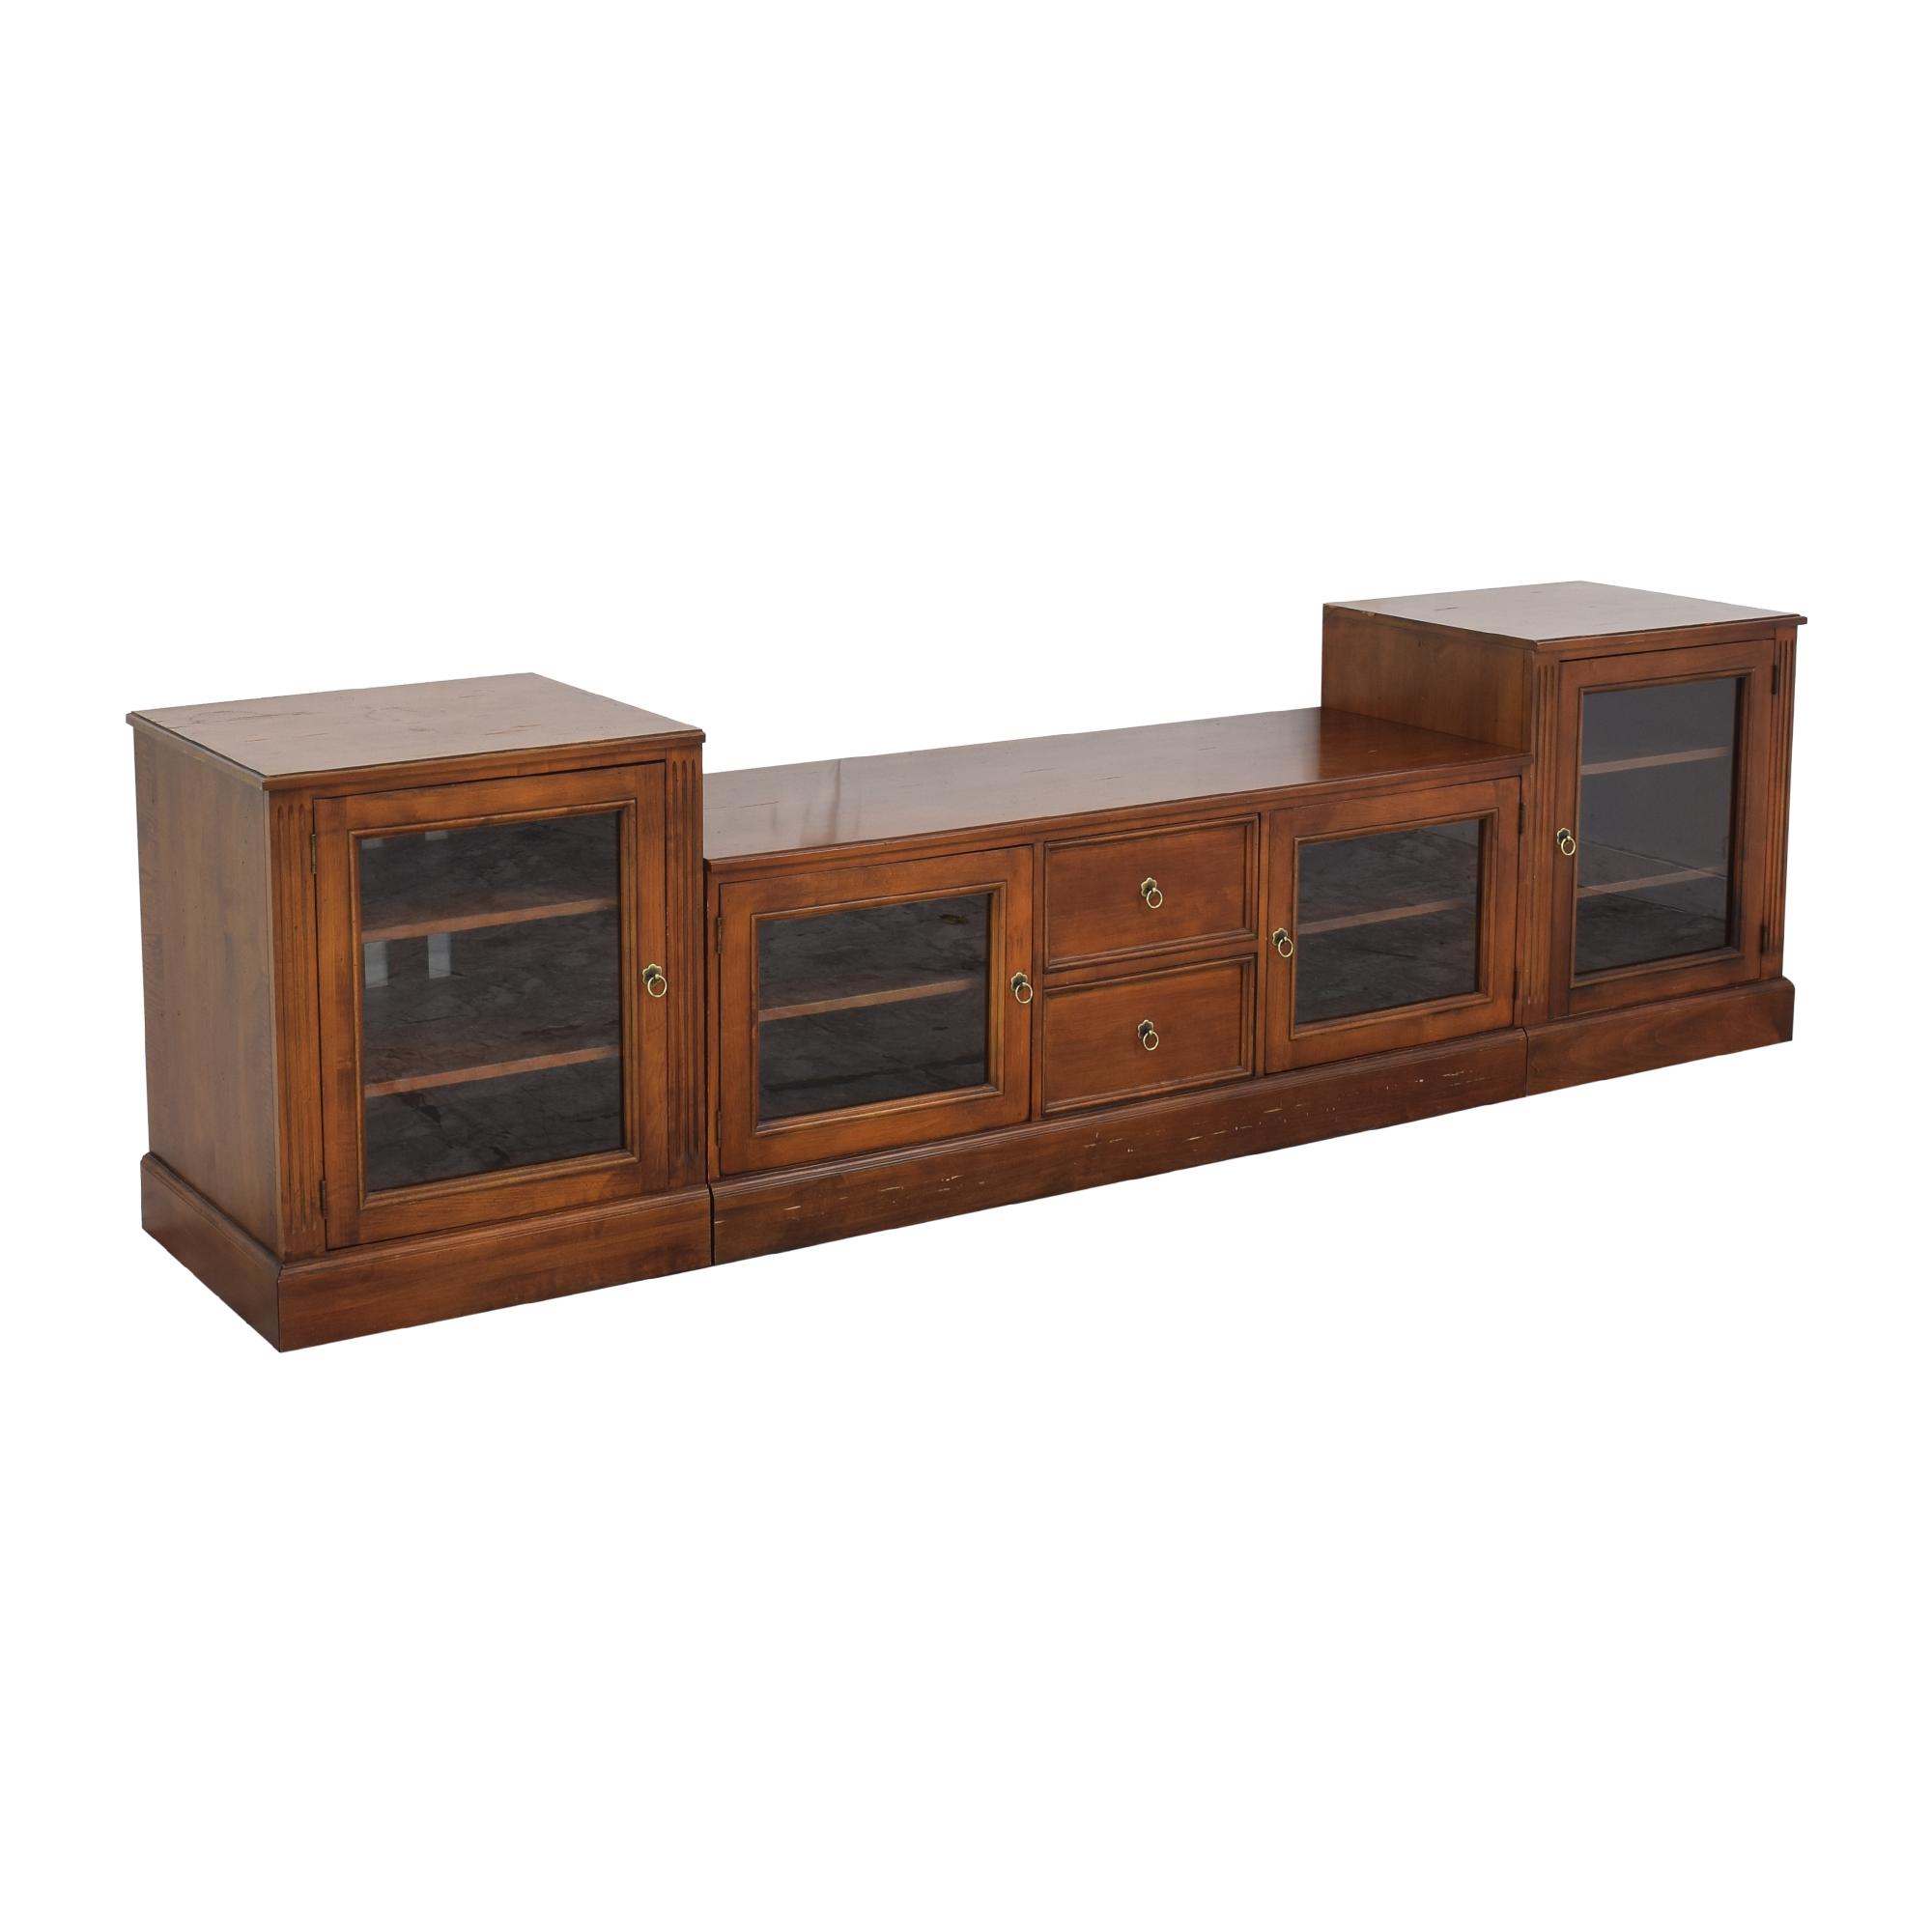 shop Ethan Allen British Classics Media Console Ethan Allen Cabinets & Sideboards